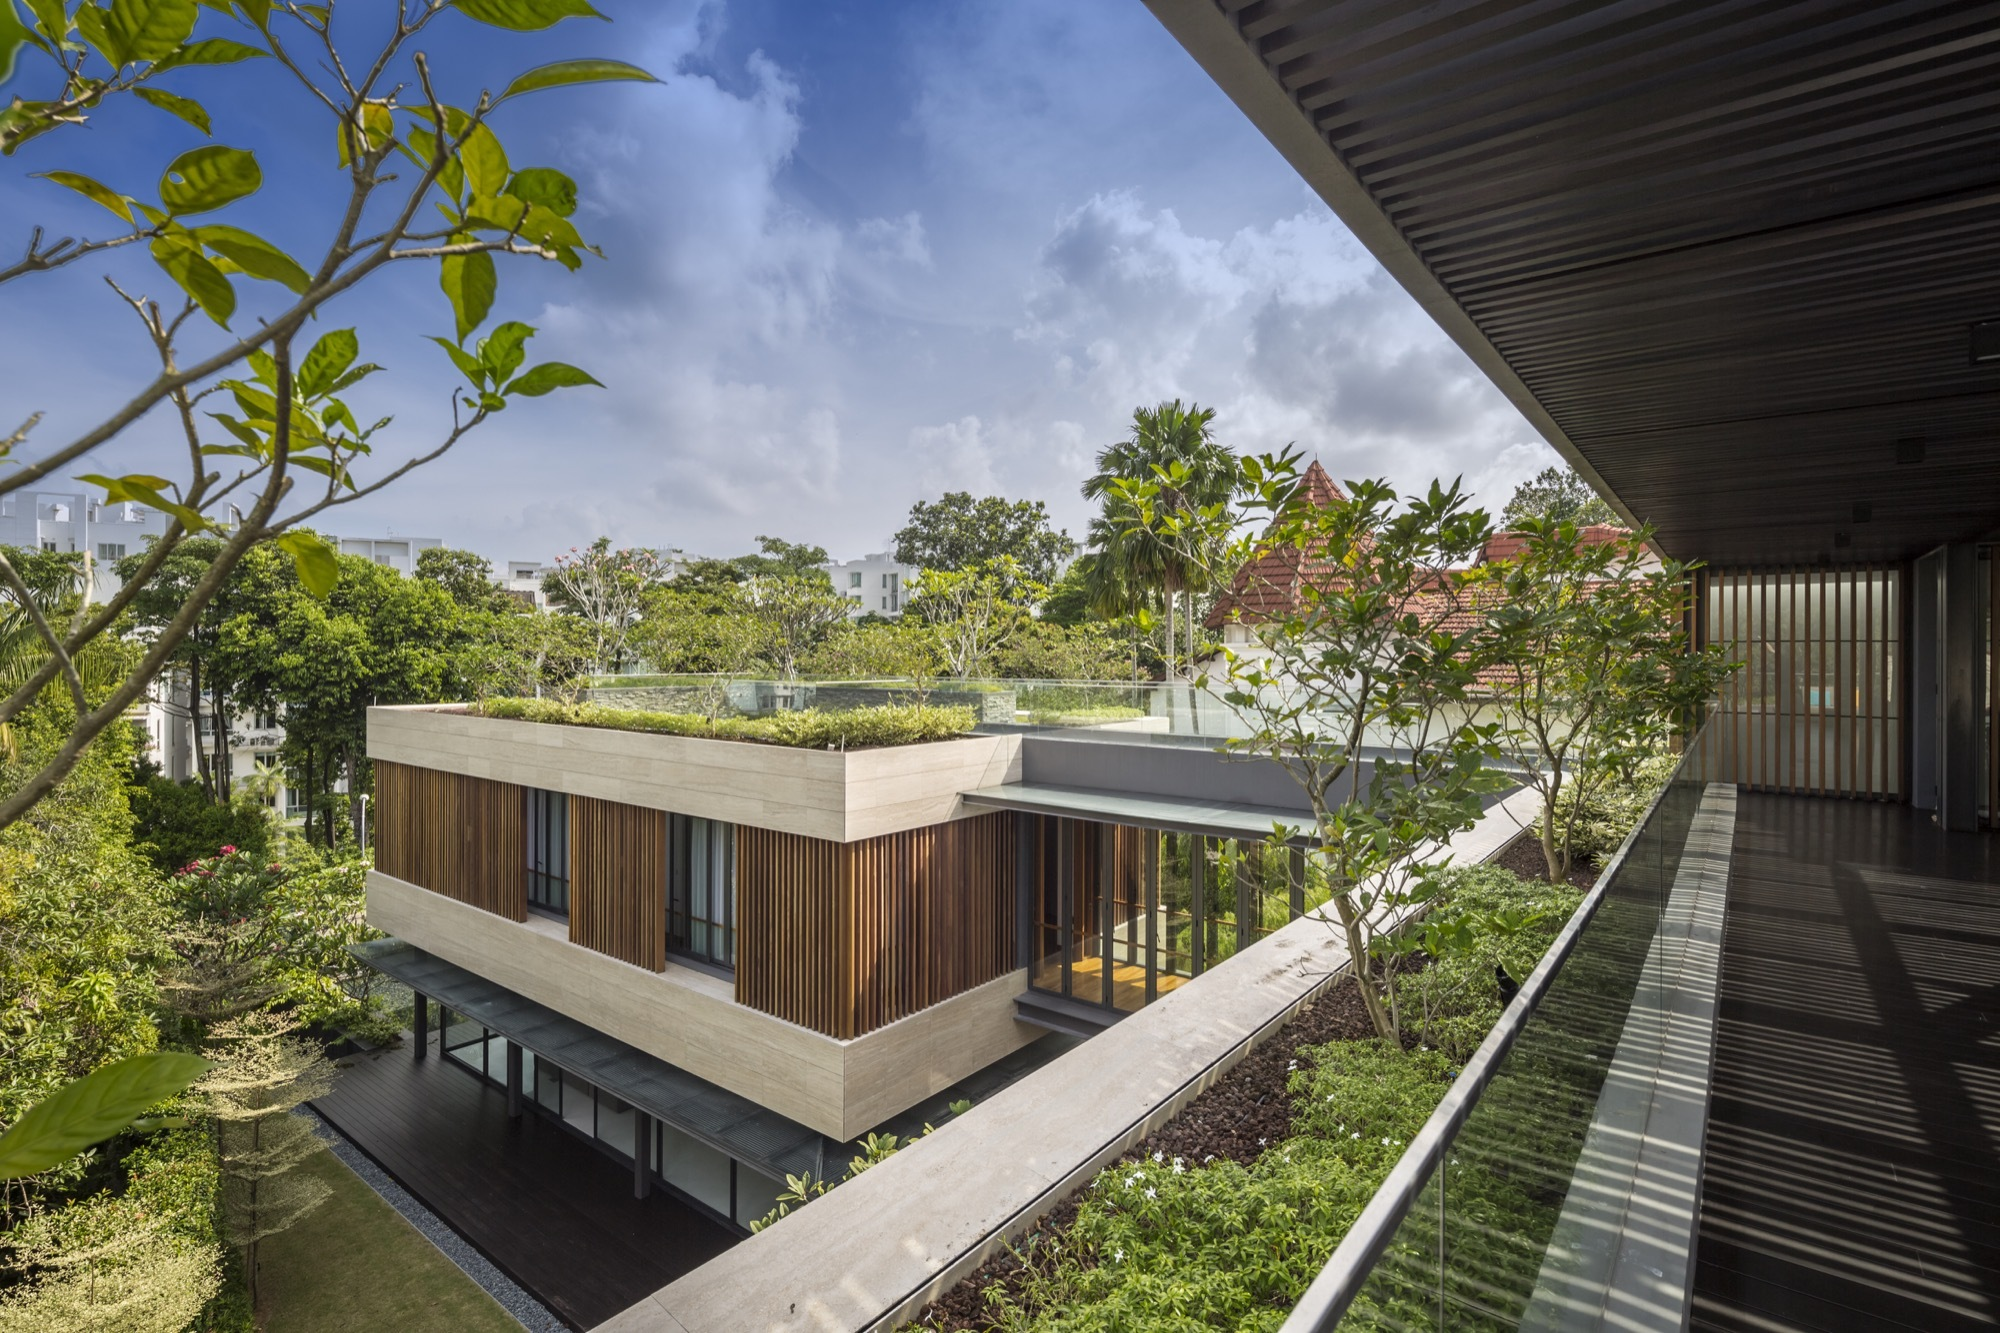 Gallery of secret garden house wallflower architecture for Home garden design singapore